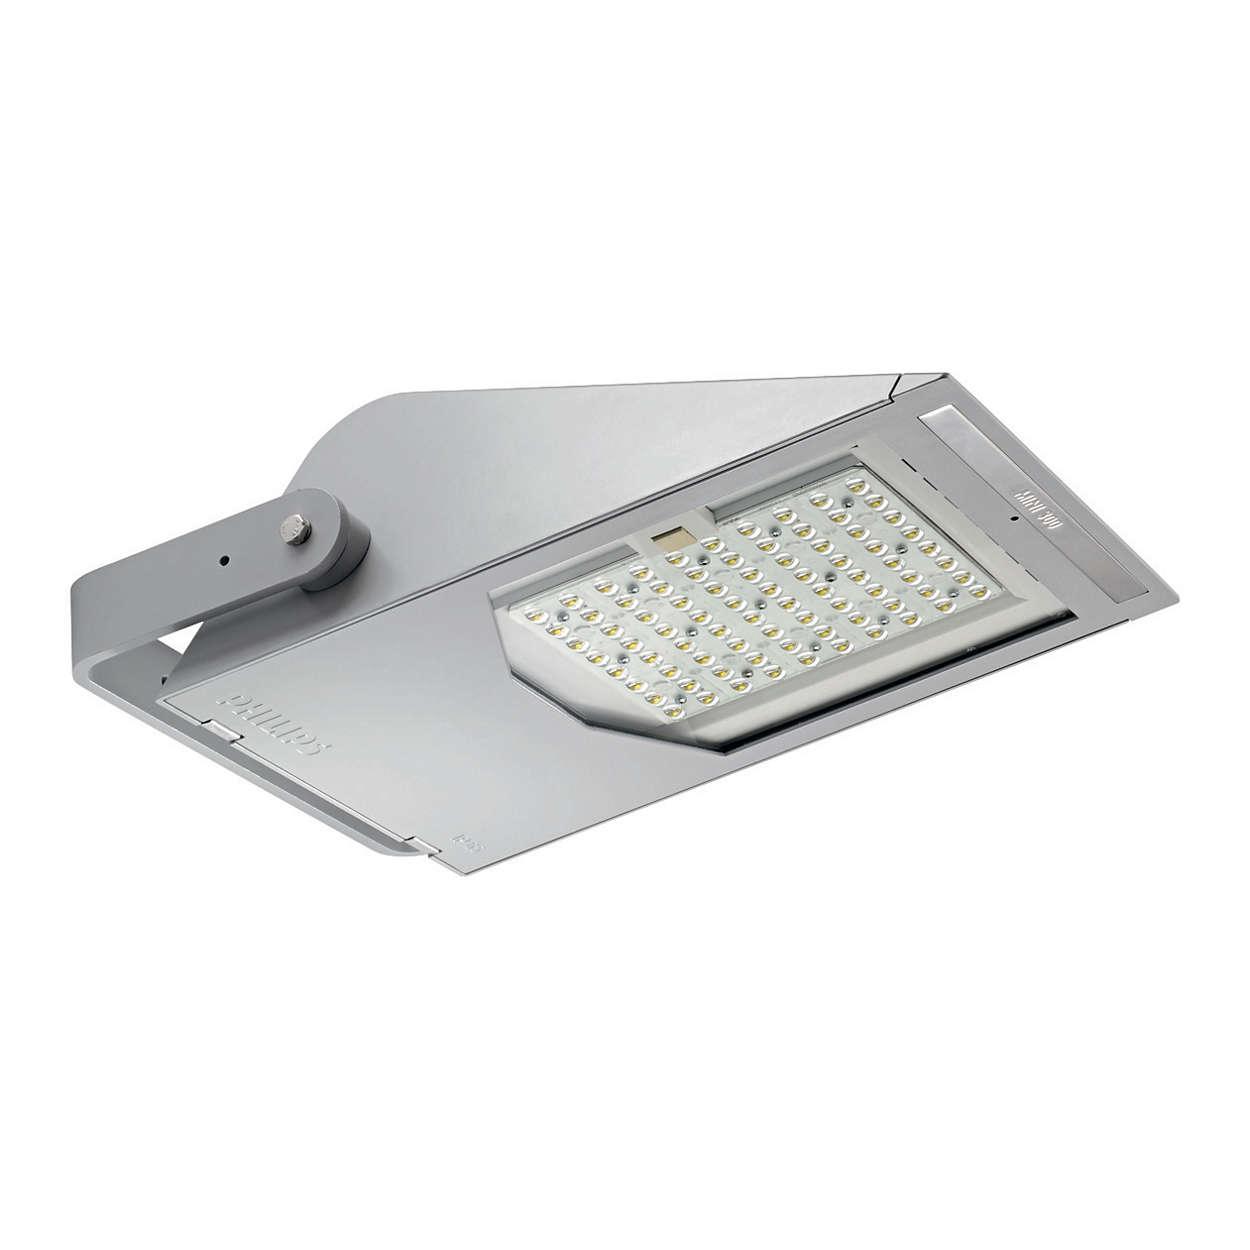 Bvp333 Eco75 3s 757 Psu I S Si Mini 300 Stealth Led White Flood Lamp Circuit B2b Electronic Components Power Elegance And Savings